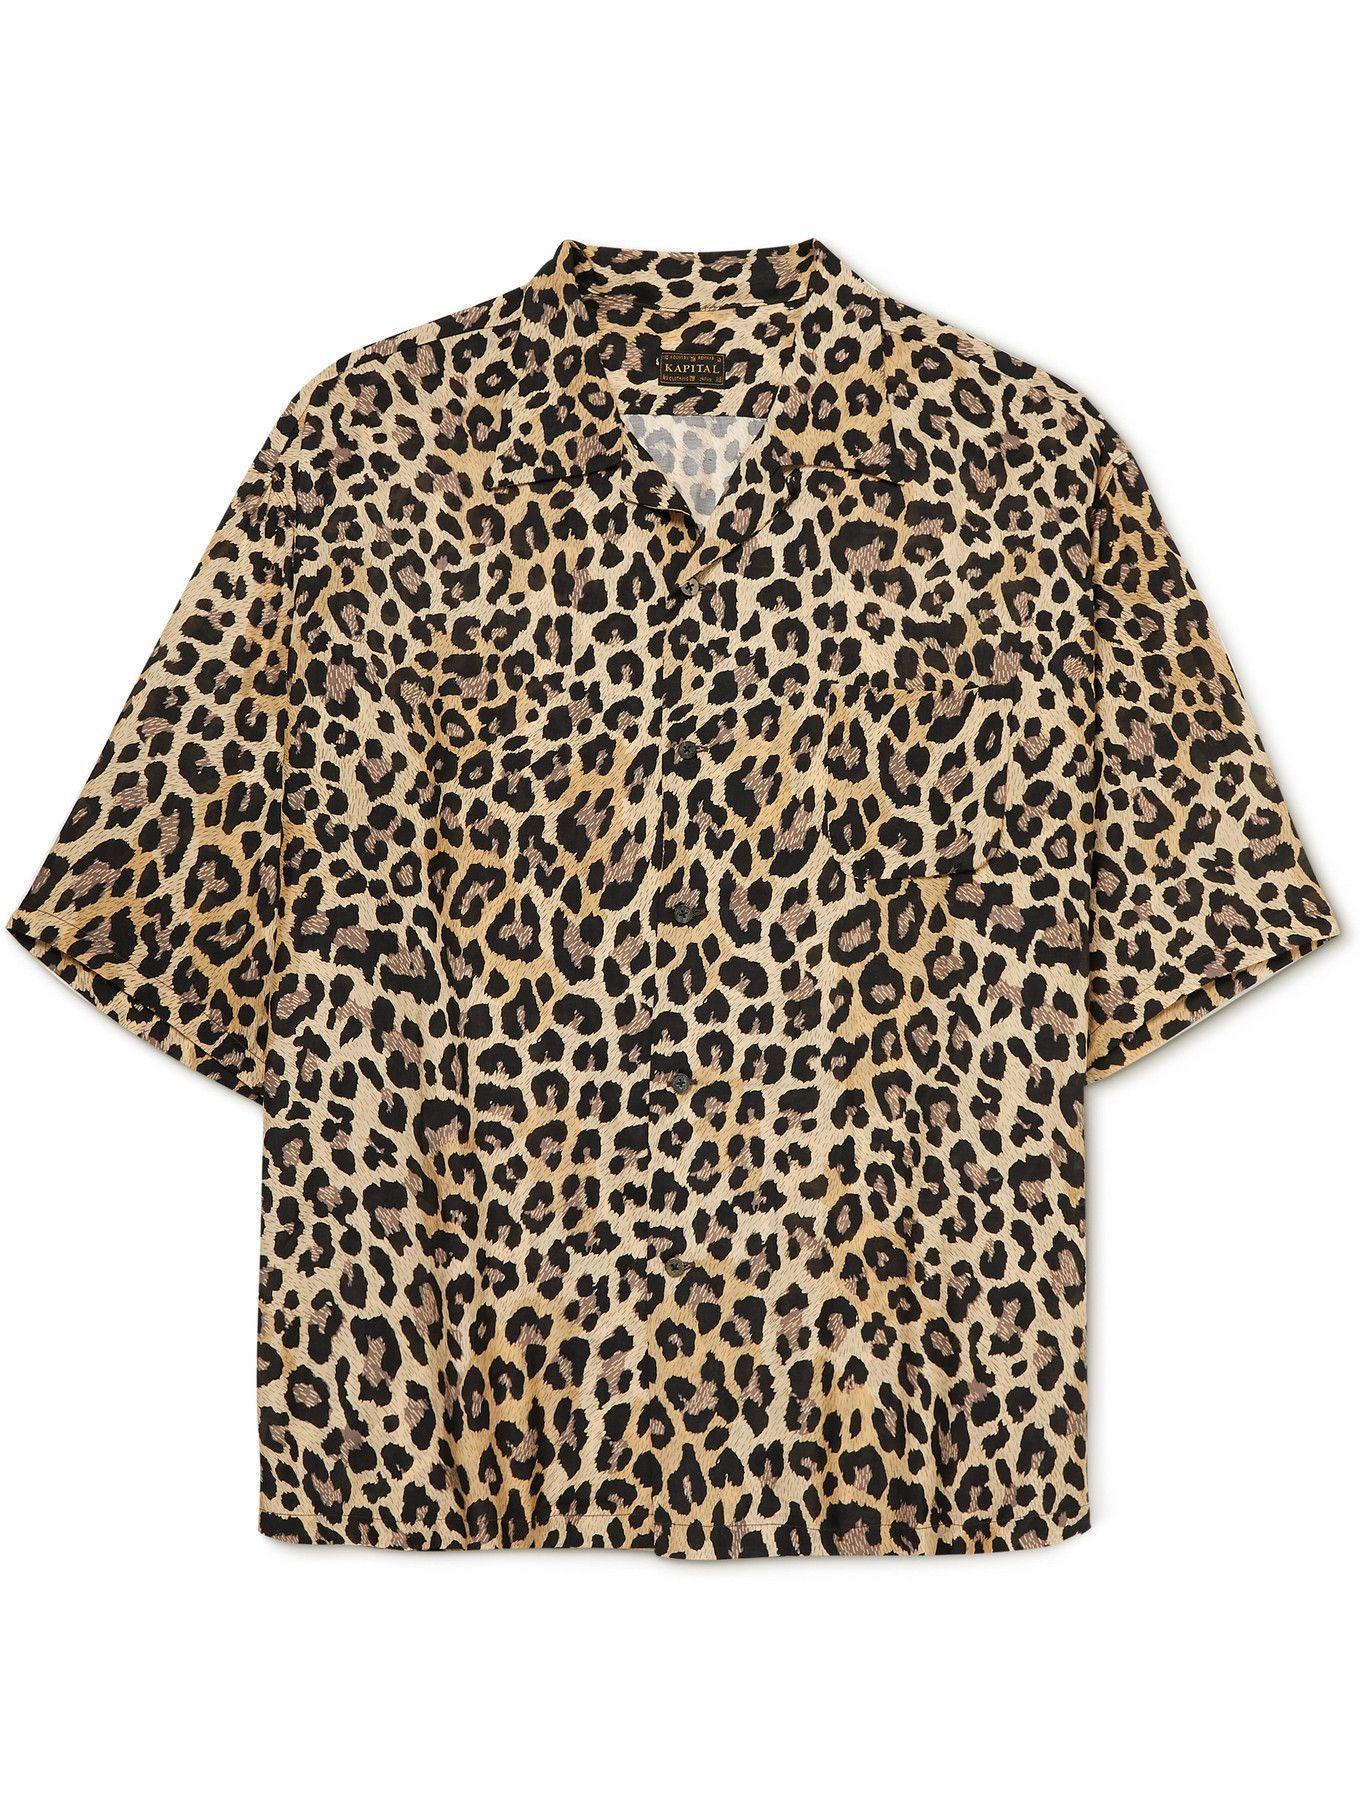 KAPITAL - Oversized Camp-Collar Leopard-Print Voile Shirt - Brown